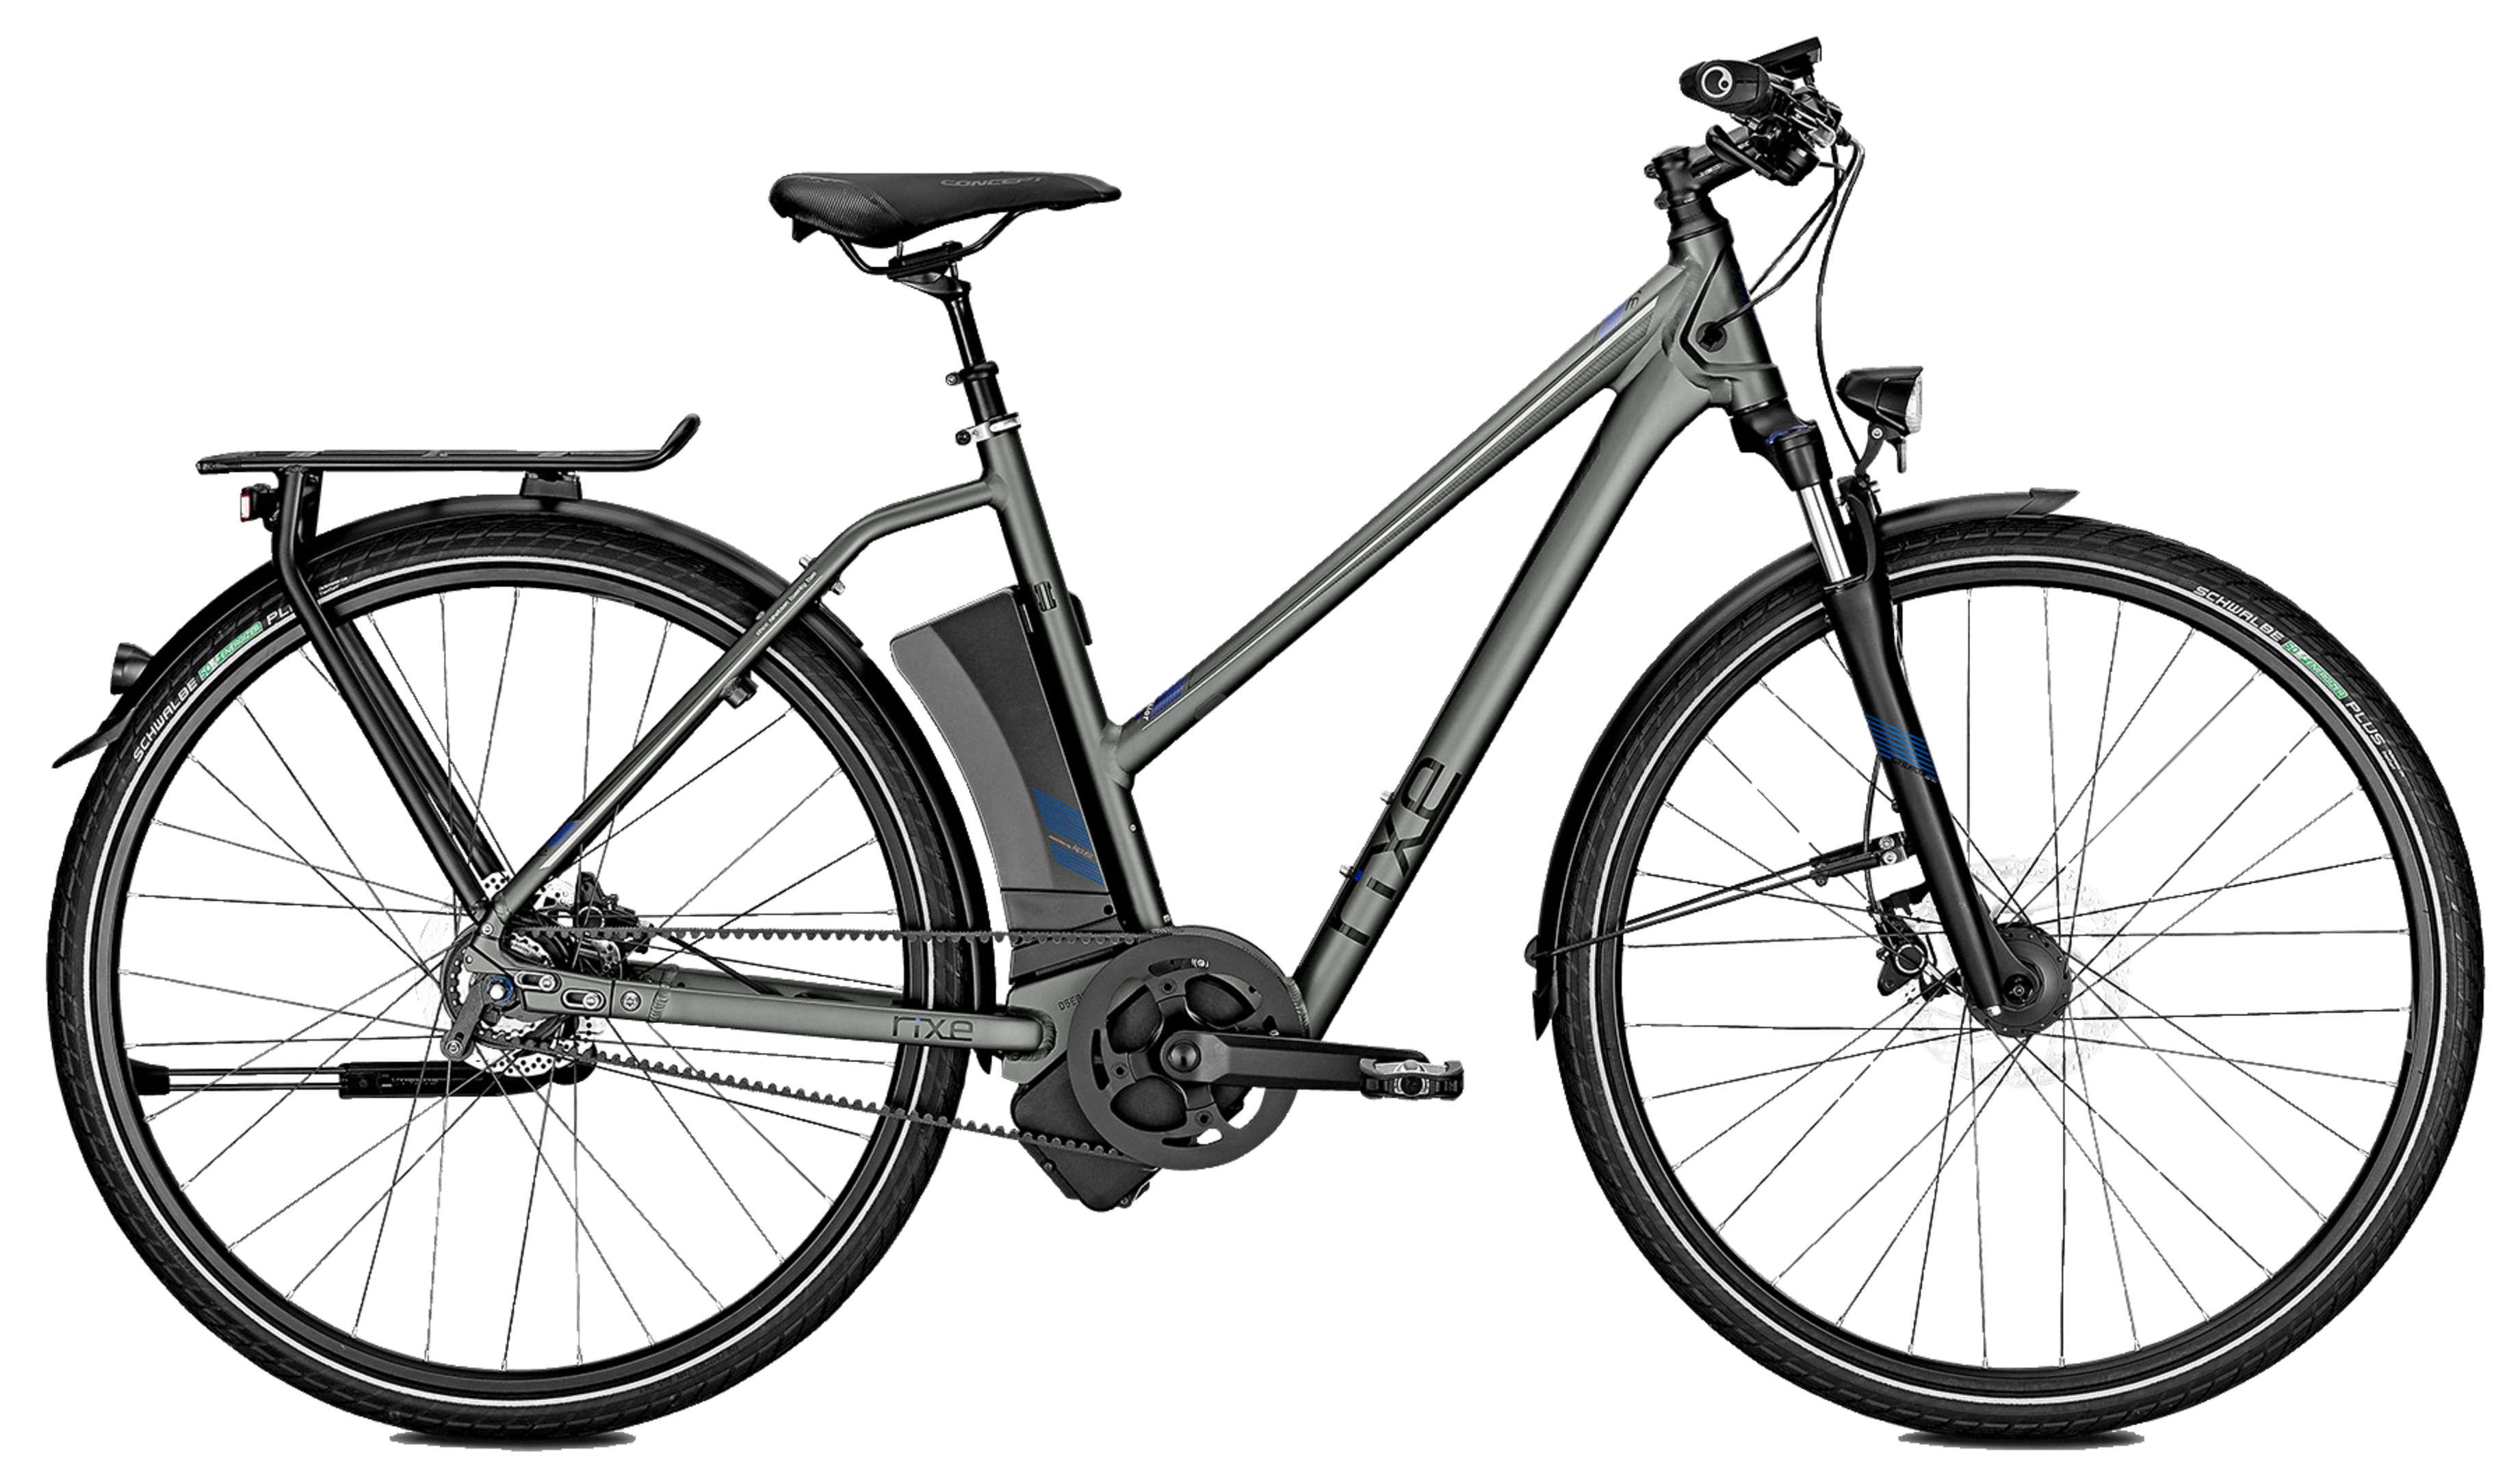 rixe e bike montpellier i8 premium 17 0ah eurorad bikeleasingeurorad bikeleasing. Black Bedroom Furniture Sets. Home Design Ideas